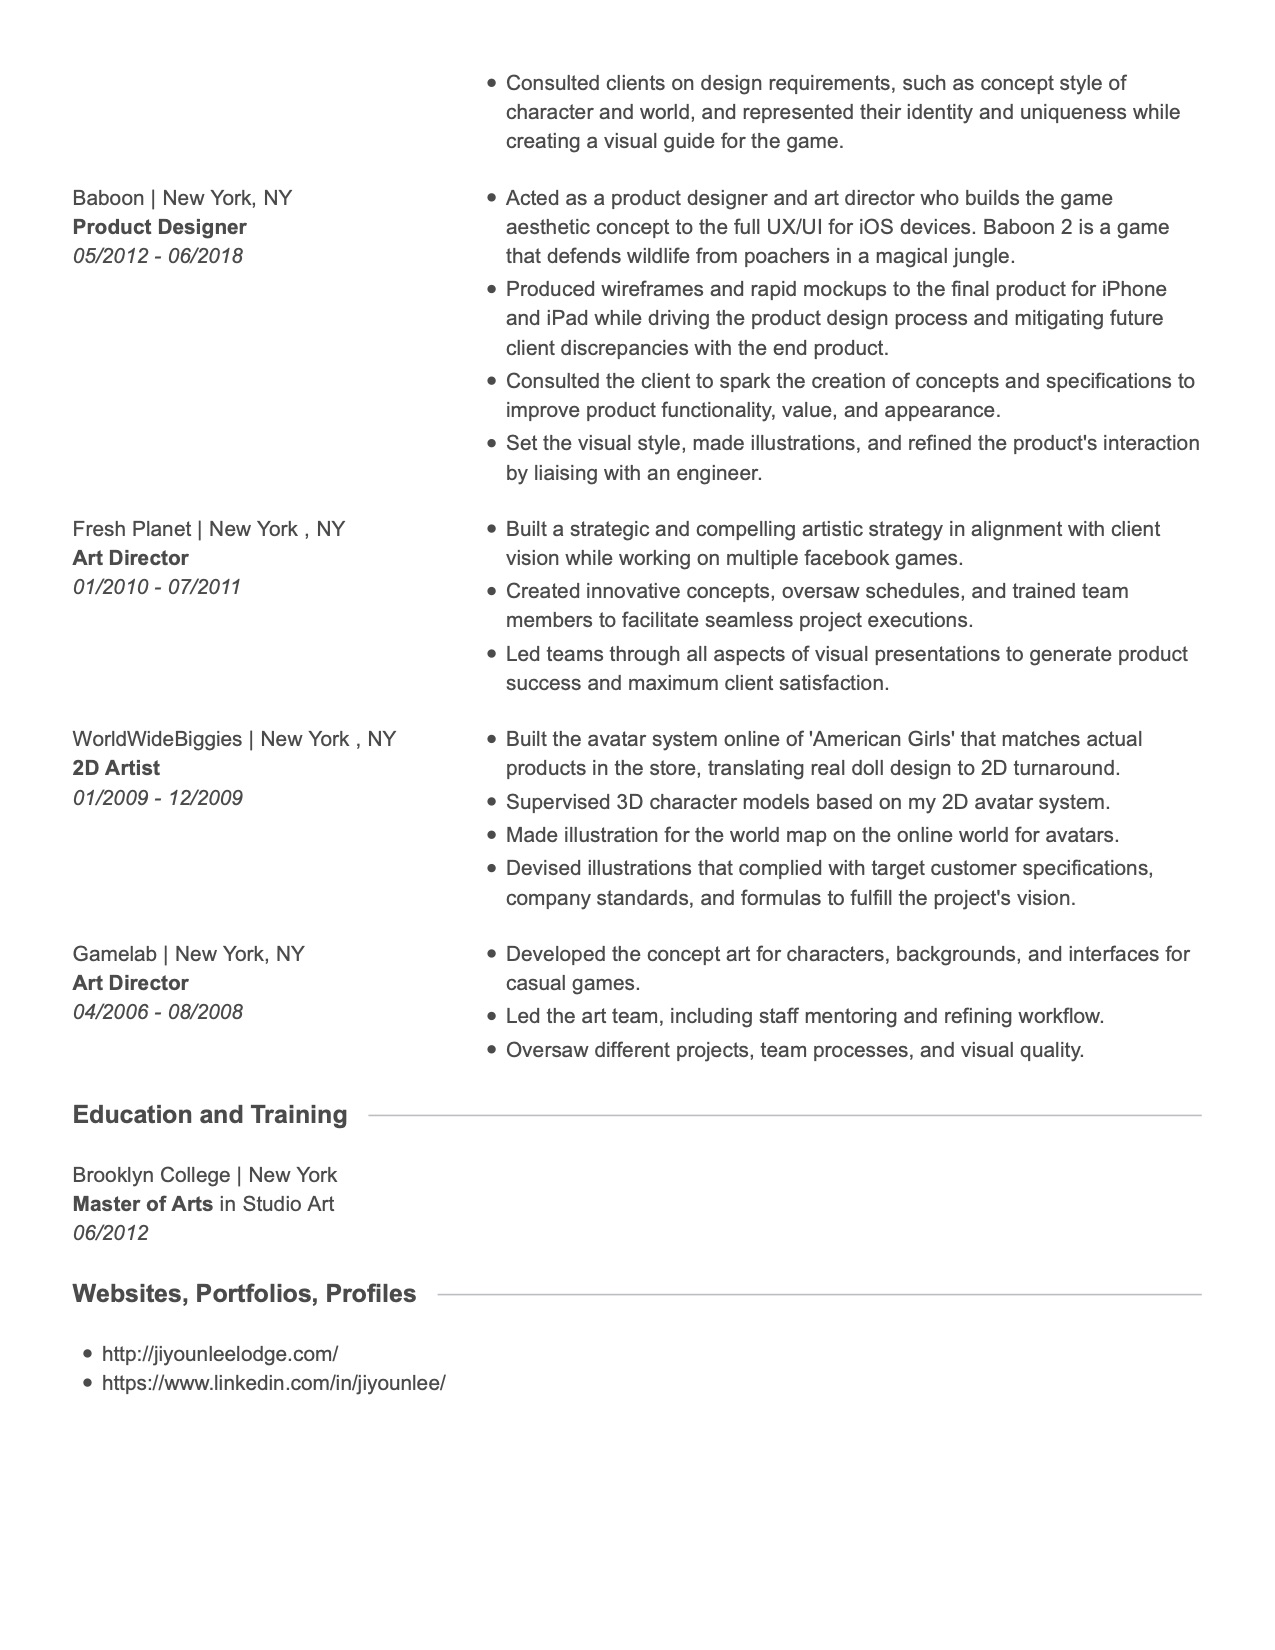 resume-p3